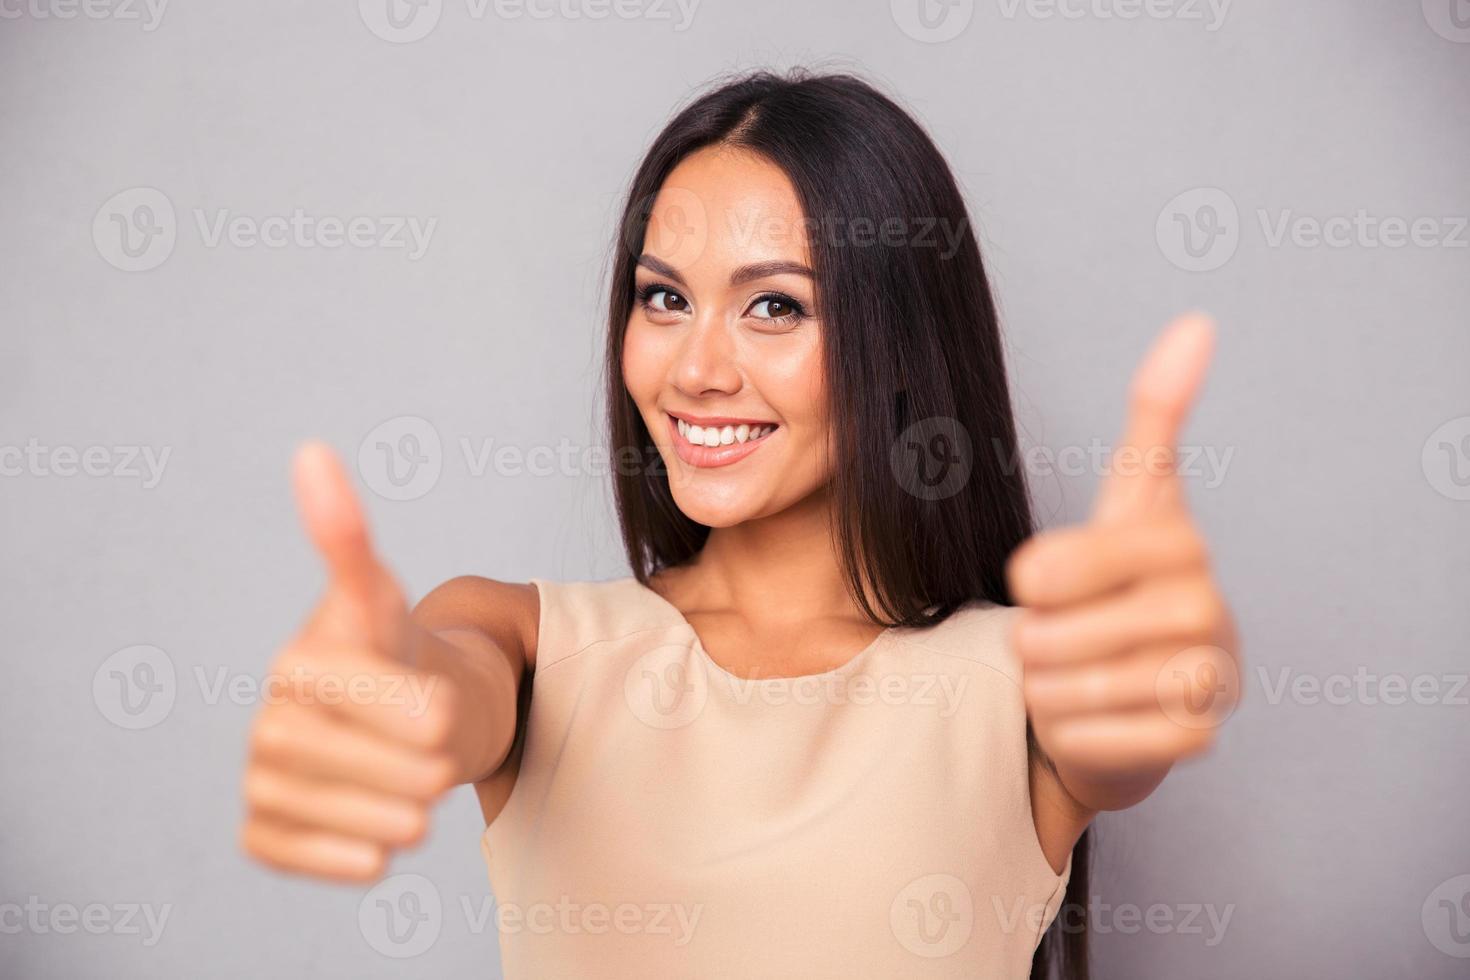 mulher sorridente, mostrando os polegares foto